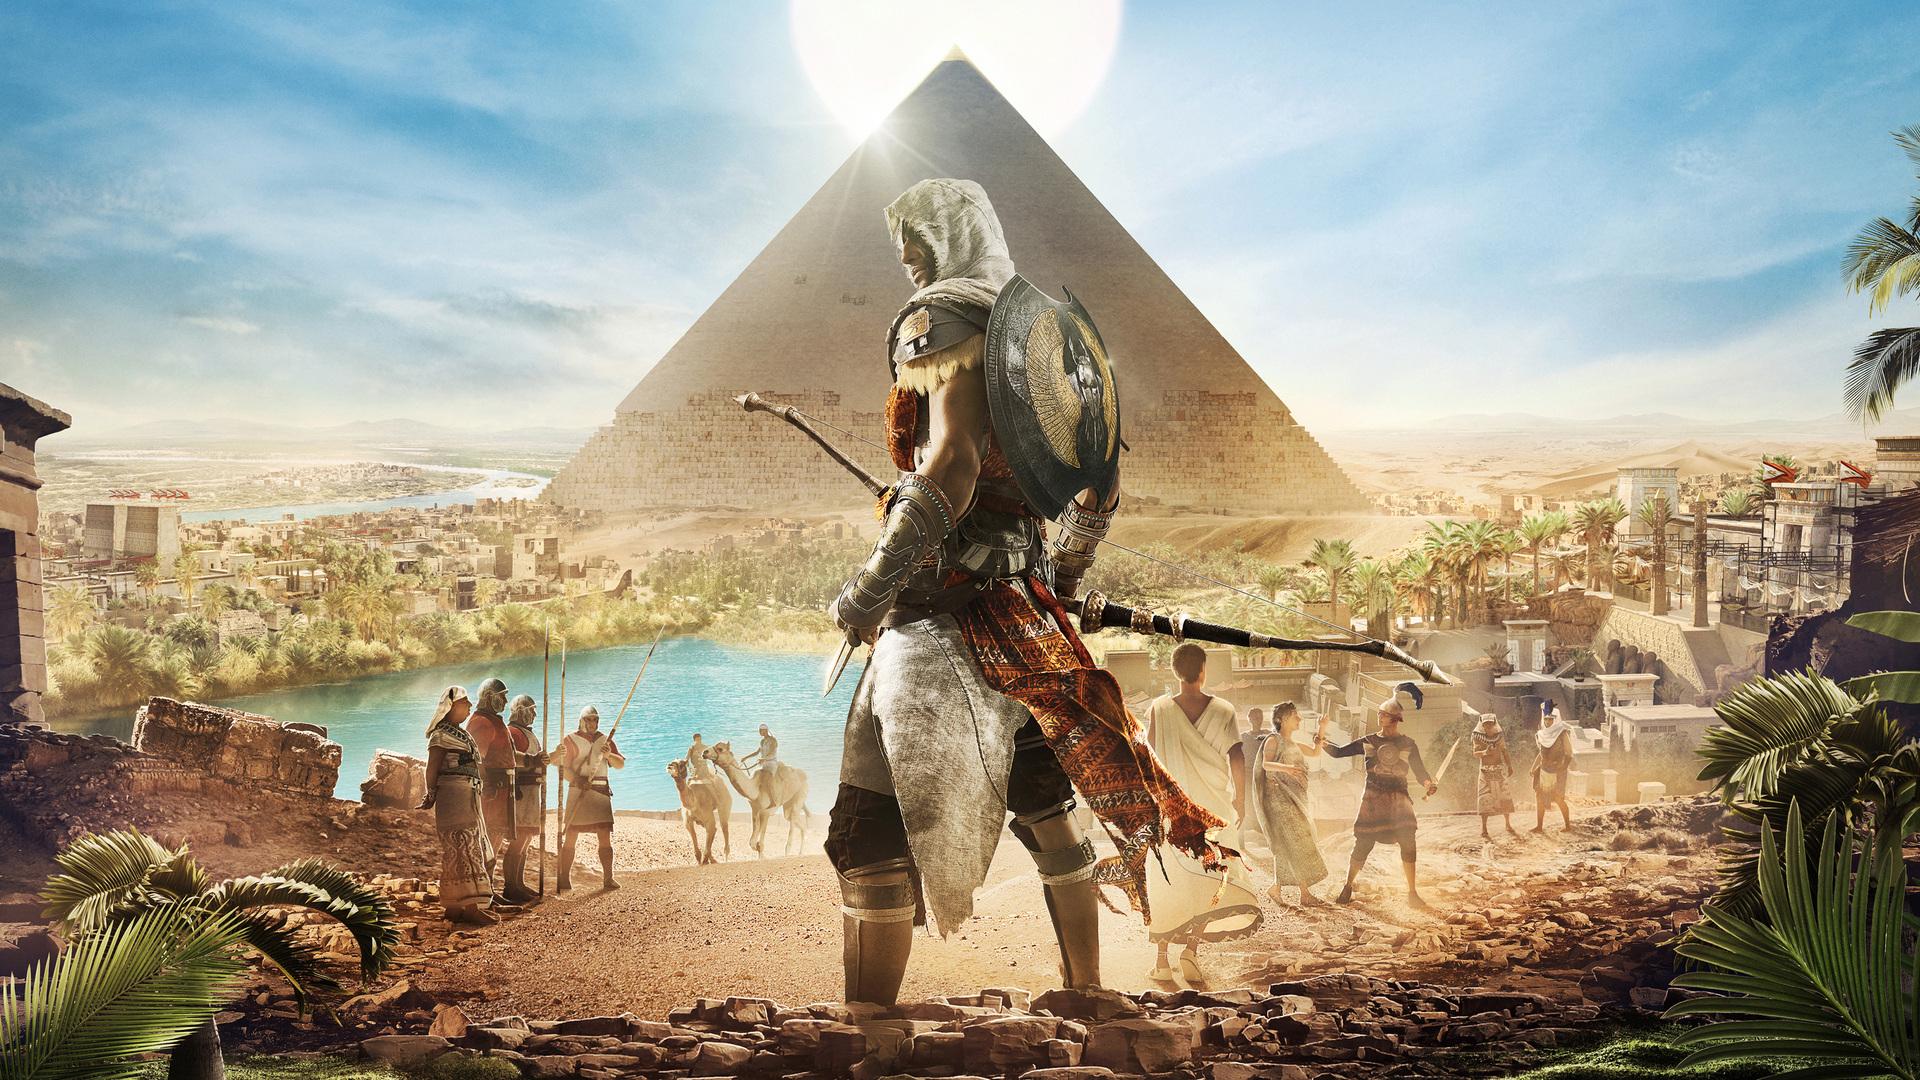 1920x1080 Assassins Creed Origins Bayek 4k Laptop Full Hd 1080p Hd